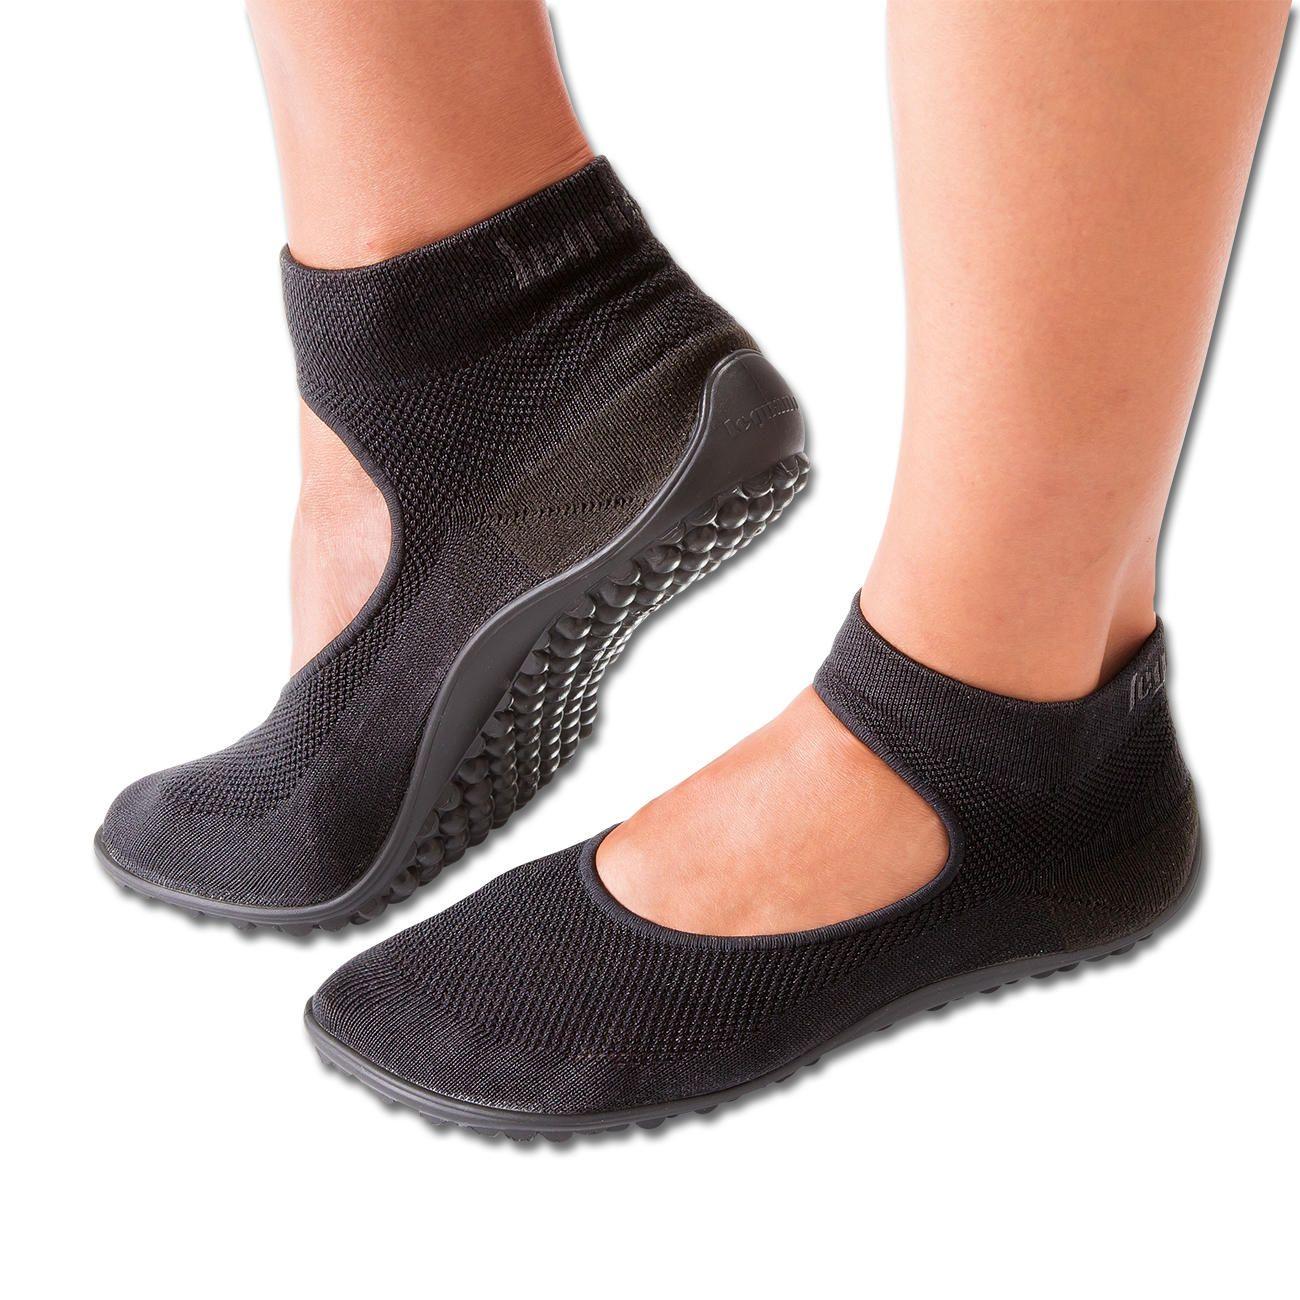 Chanclas de Playa Zapatos de Piscina para Ni/ña Ni/ño Sandalias Verano Antideslizante Zapatillas de Ba/ño Casa Hombre Mujer